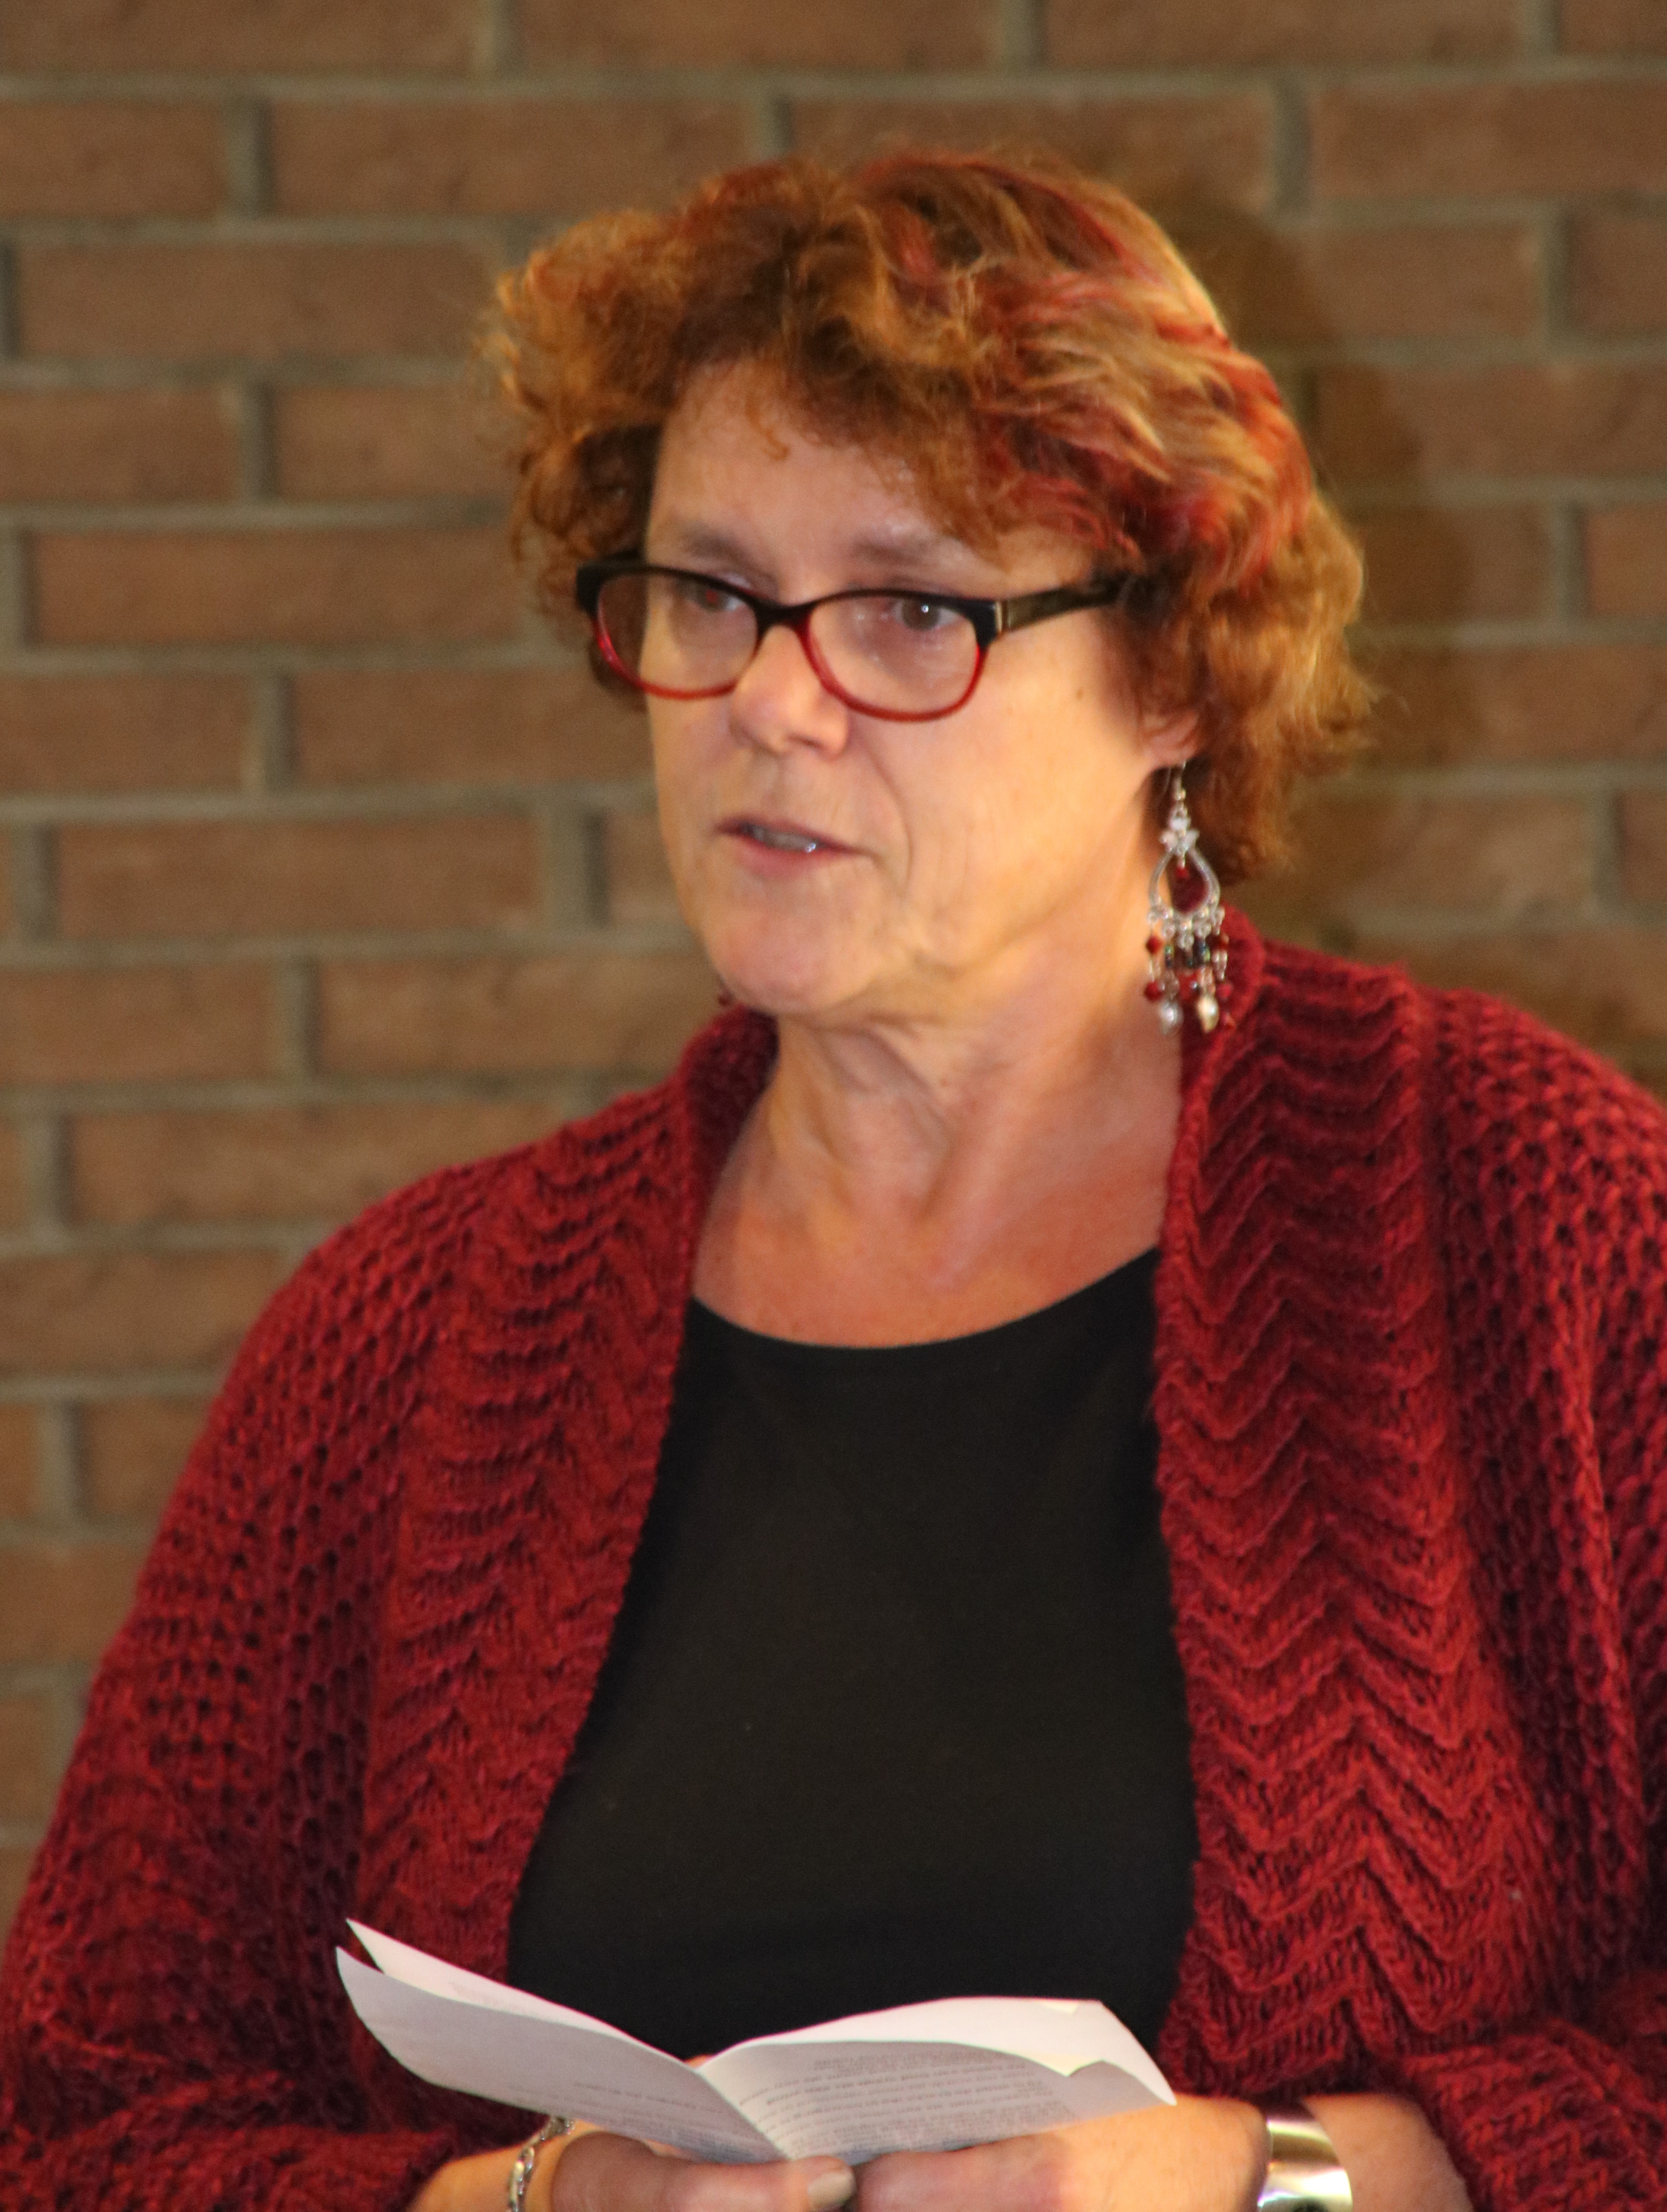 Martha Verstoep